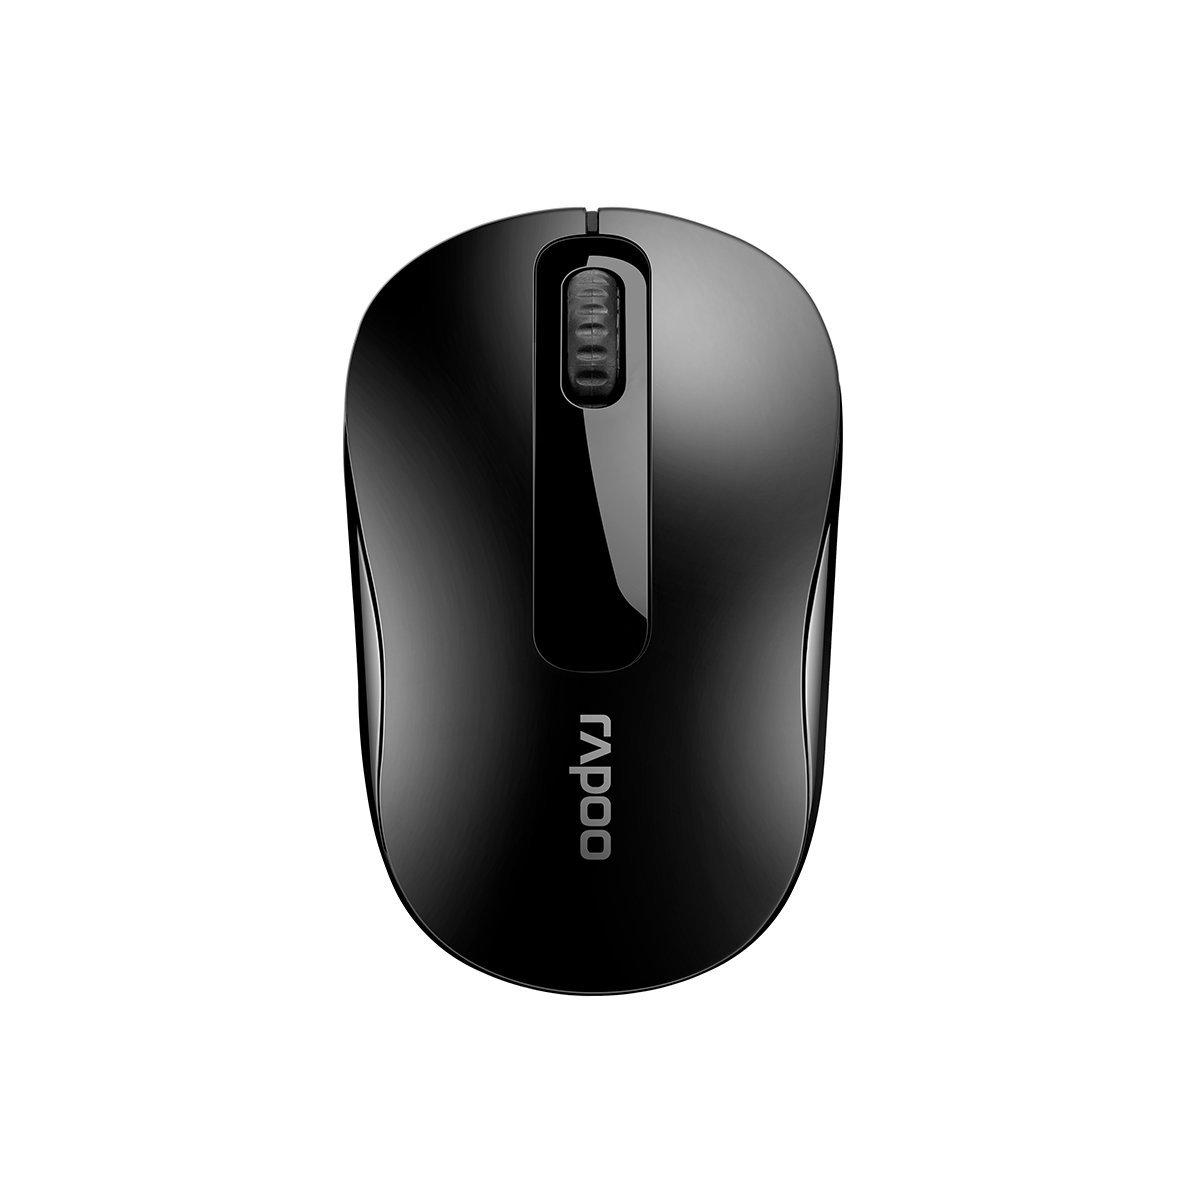 RAPOO, M10, PLUS, 2.4GHz, Wireless, Optical, Mouse, Black, -, 1000dpi, 3Keys,